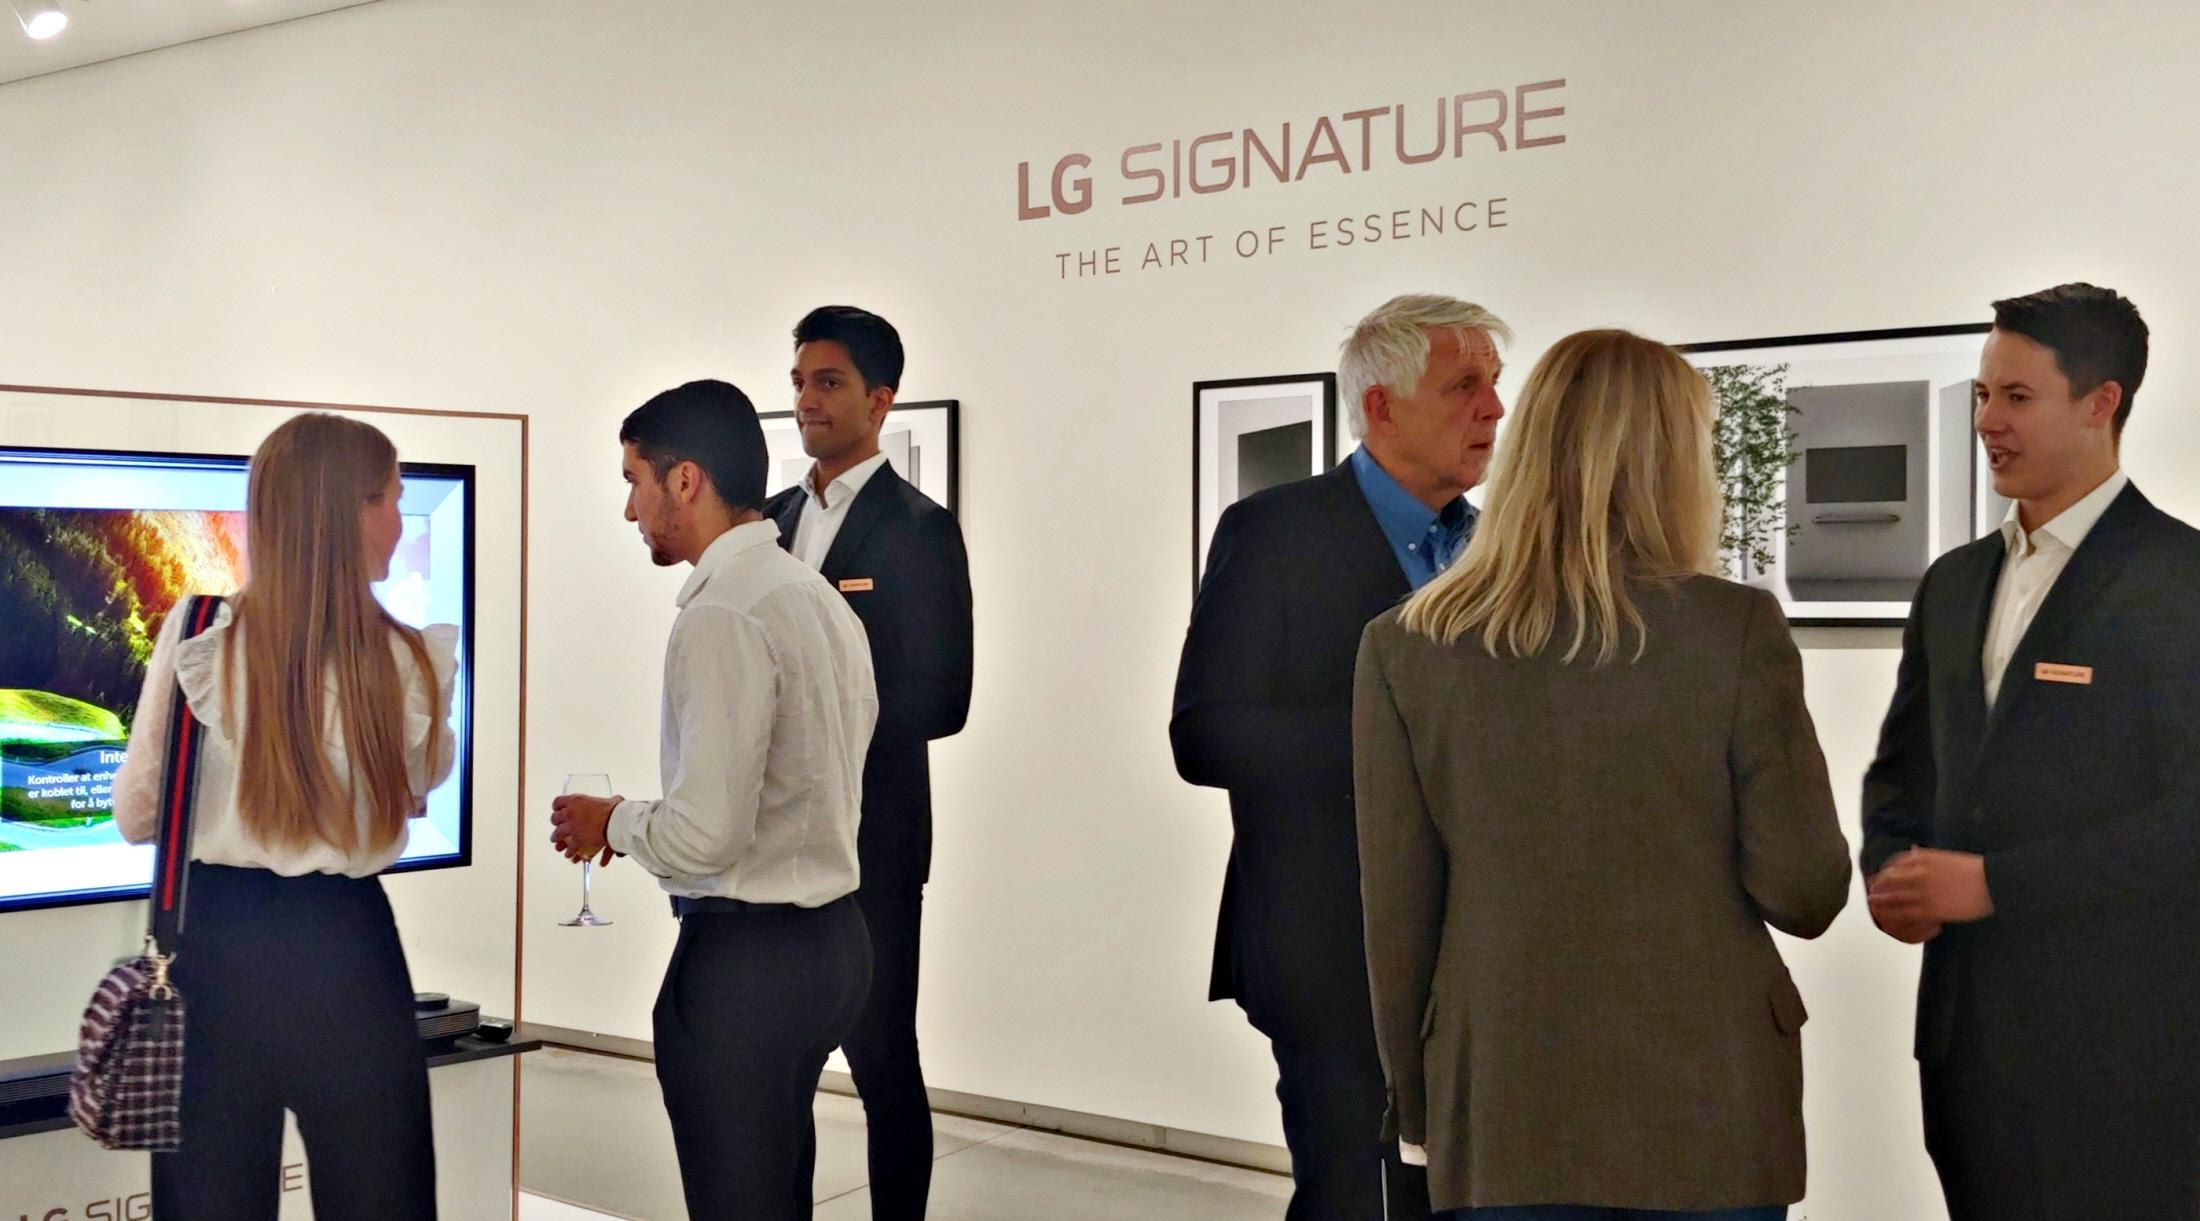 LG전자가 현지시간 13일 노르웨이 오슬로에 위치한 아스트룹 피언리 현대미술관(Astrup Fearnley Museet)에서 현지 거래선, 기자, 오피니언 리더 등 200여 명을 초청해 LG 시그니처 출시행사를 진행했다. 참석자들이 초프리미엄 'LG 시그니처'를 살펴보고 있다.